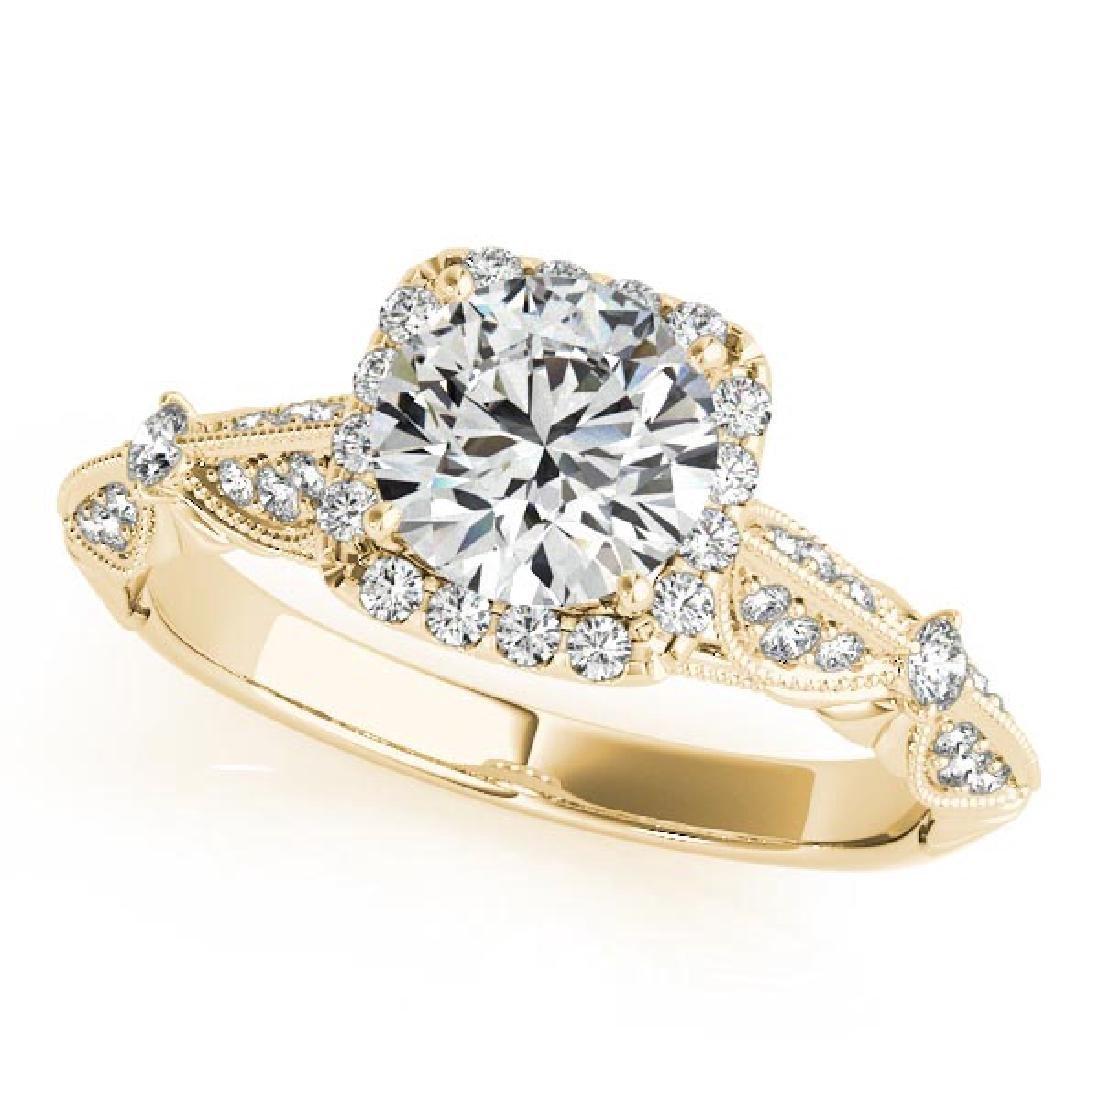 CERTIFIED 18K YELLOW GOLD 1.31 CT G-H/VS-SI1 DIAMOND HA